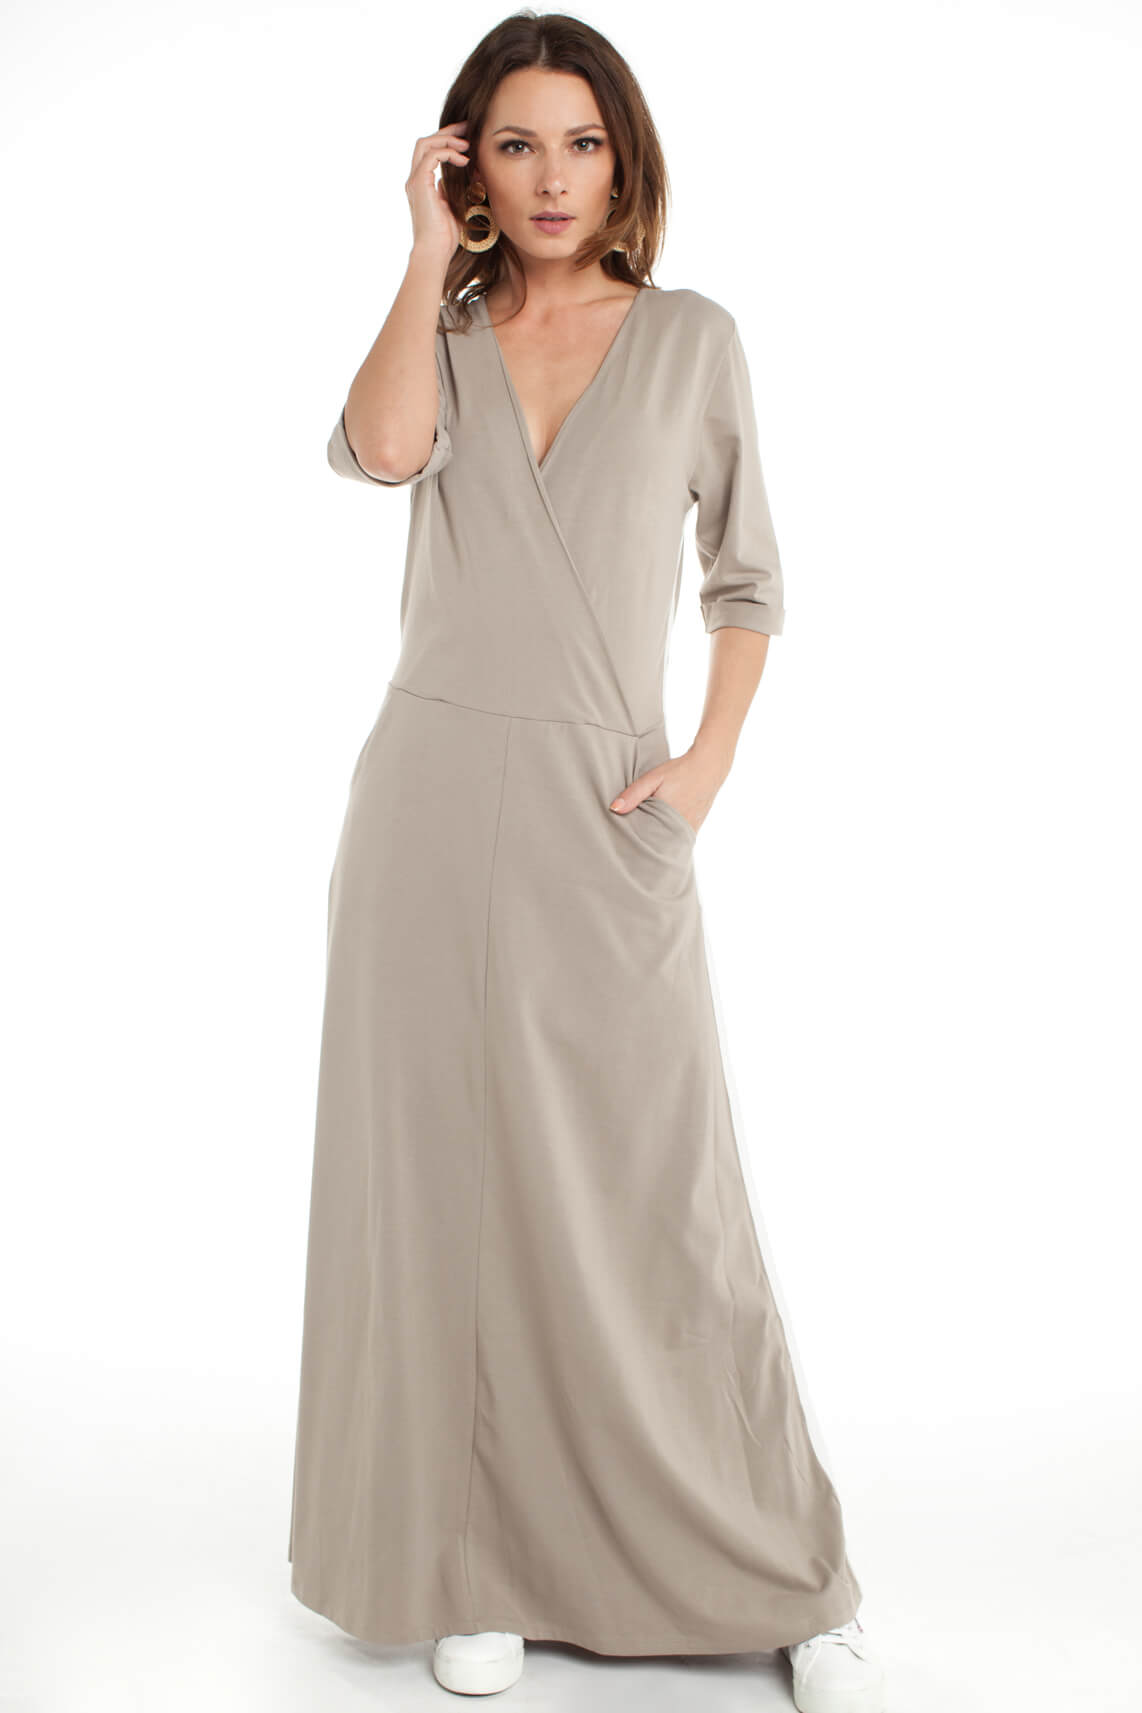 10 Days Dames Lange overslag jurk Bruin